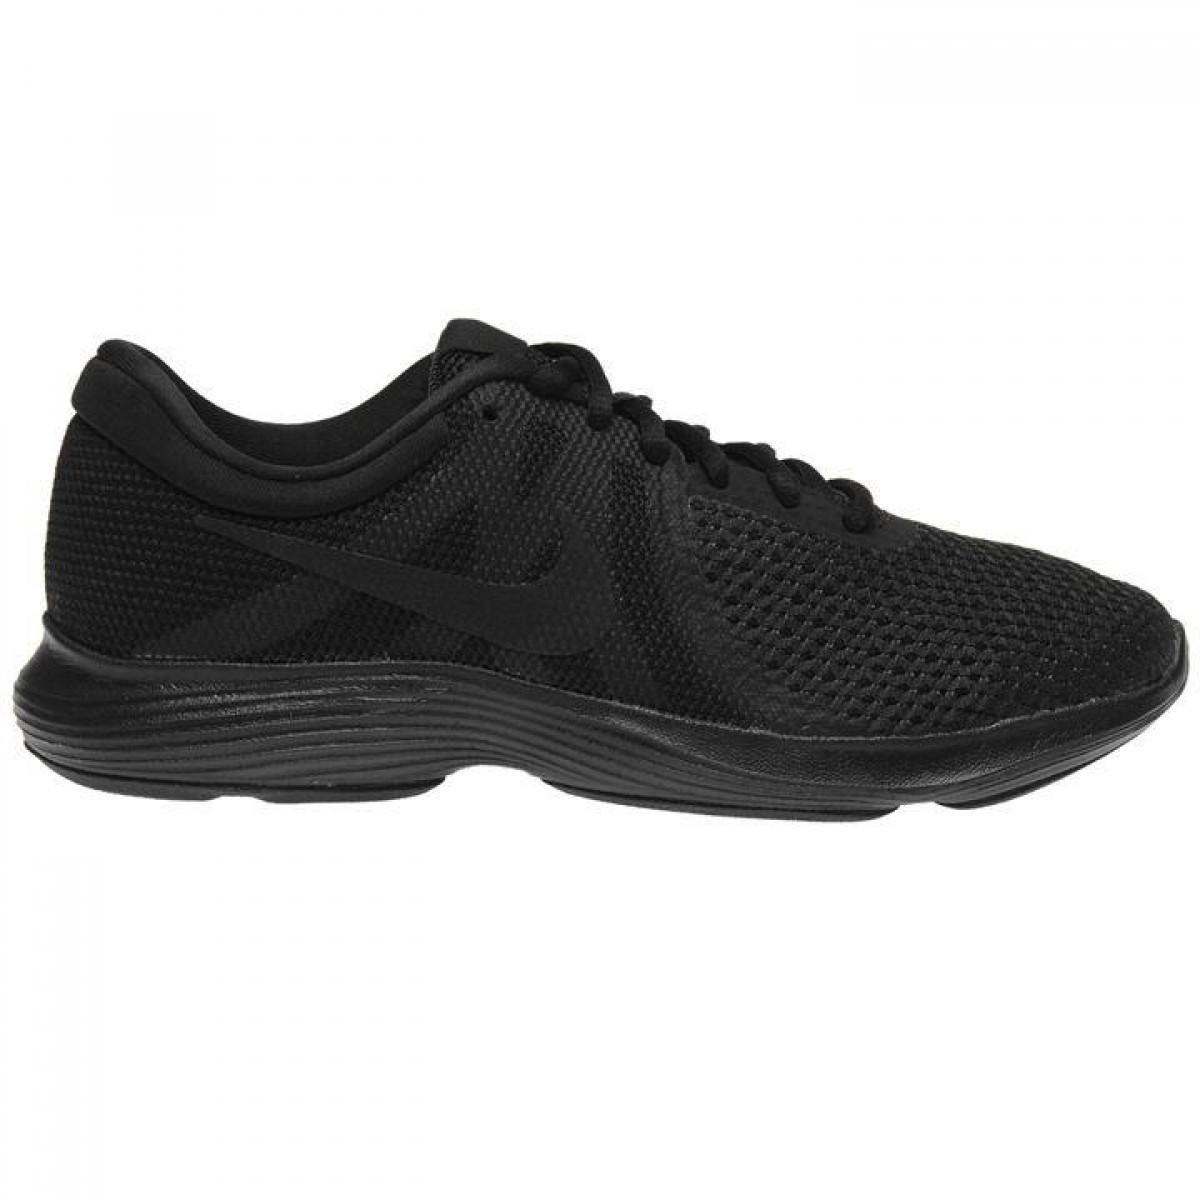 Кроссовки Nike Revolution 4 Black/Black - Оригинал, фото 1